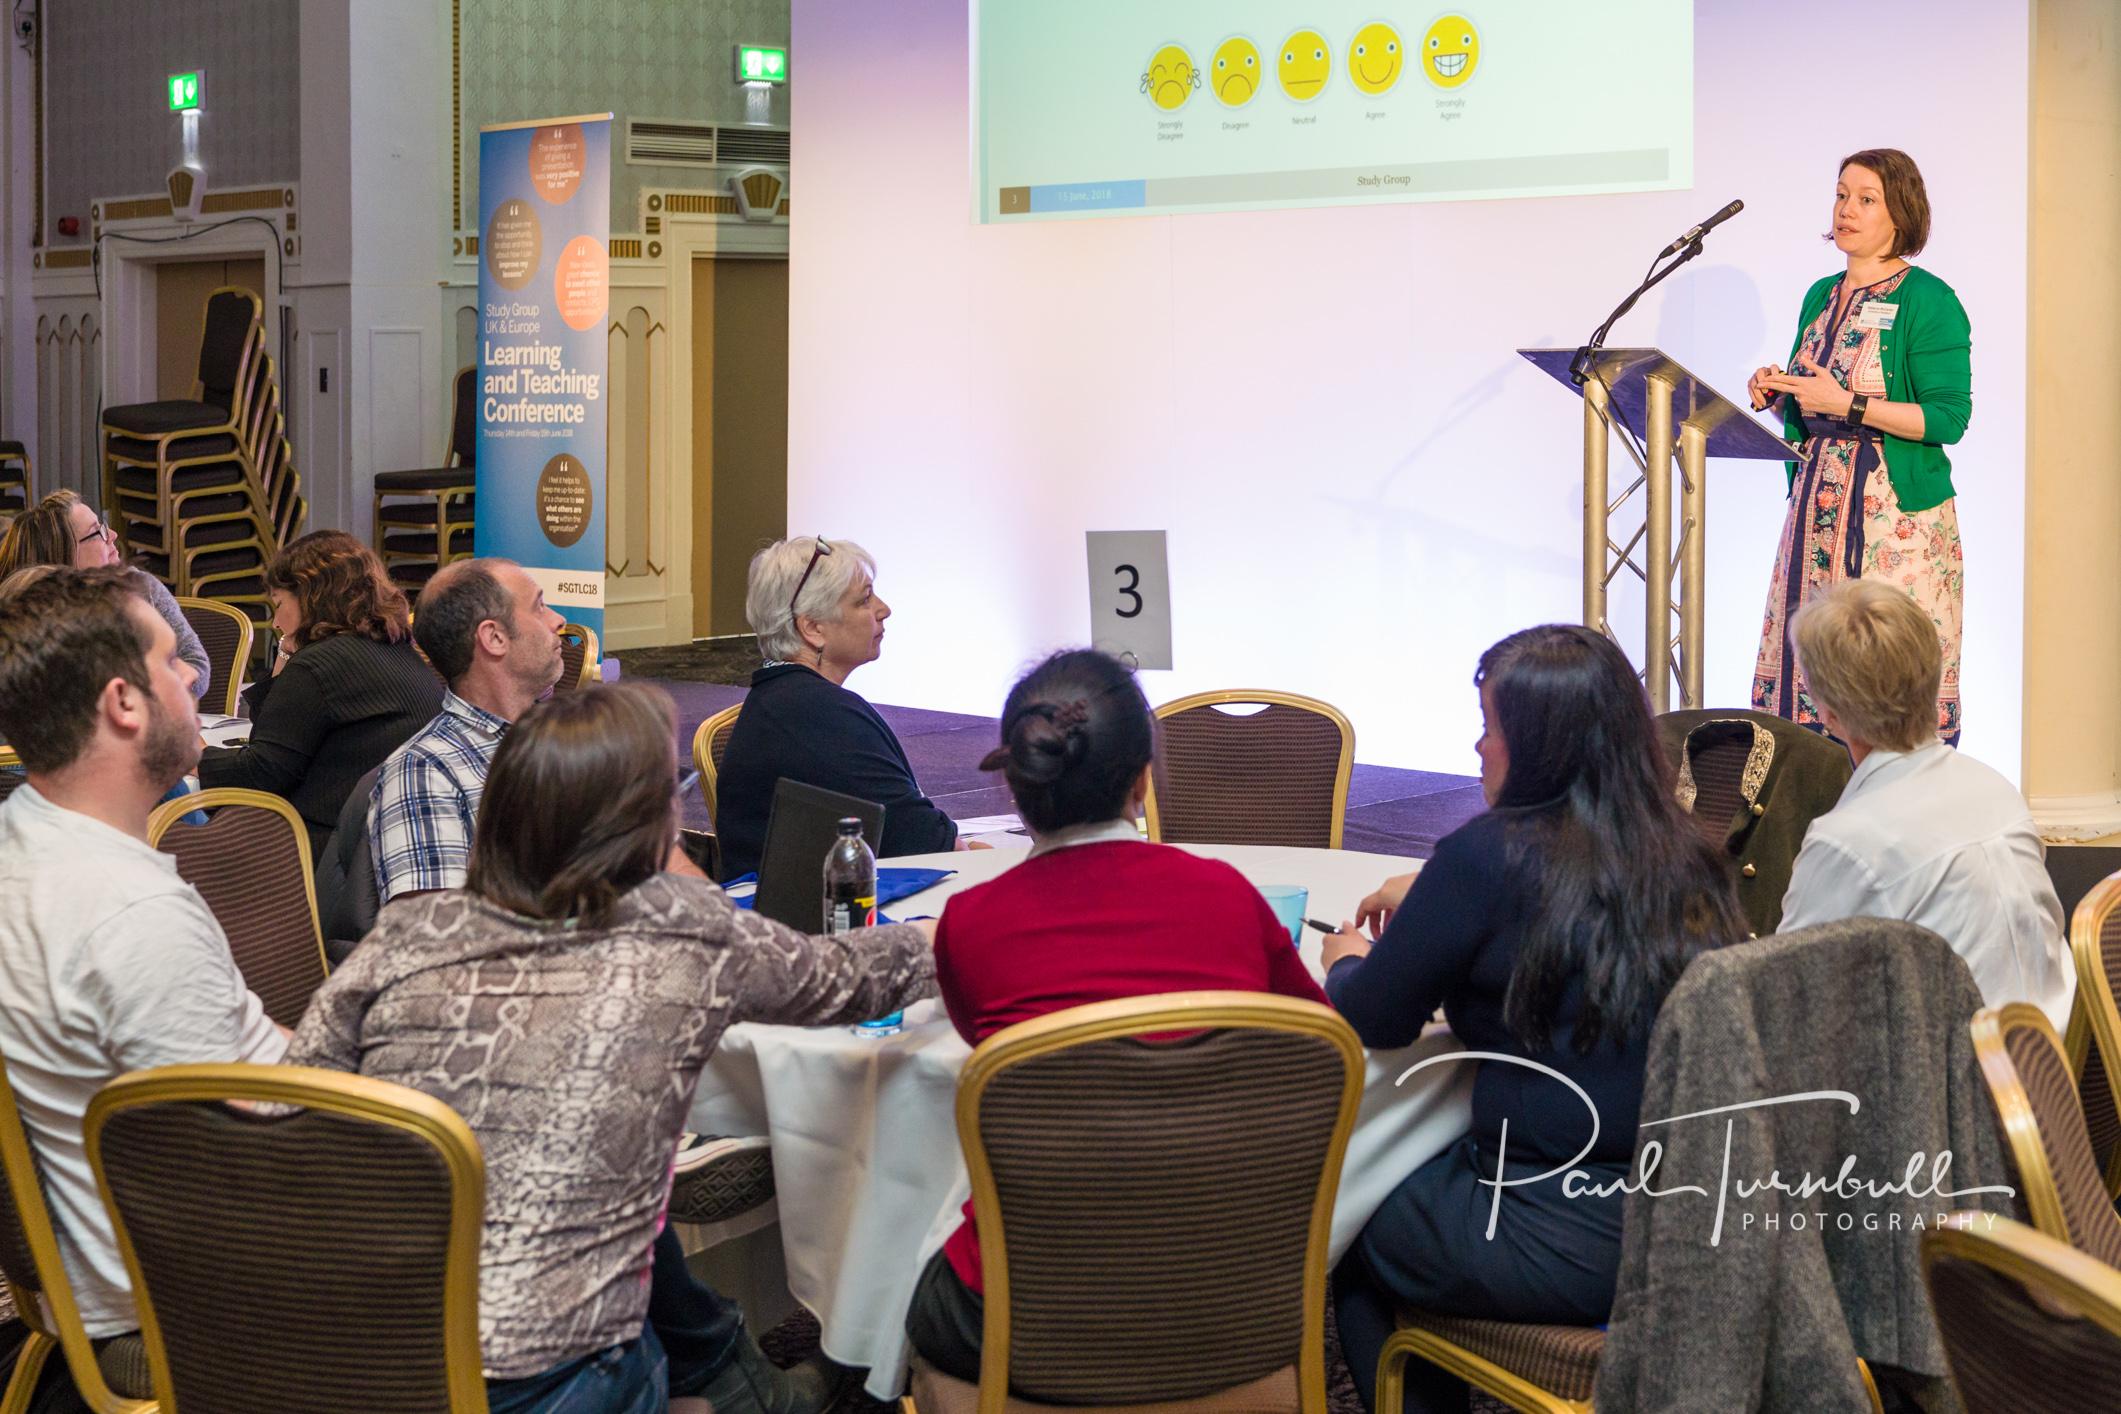 conference-event-photographer-queens-hotel-leeds-yorkshire-061.jpg